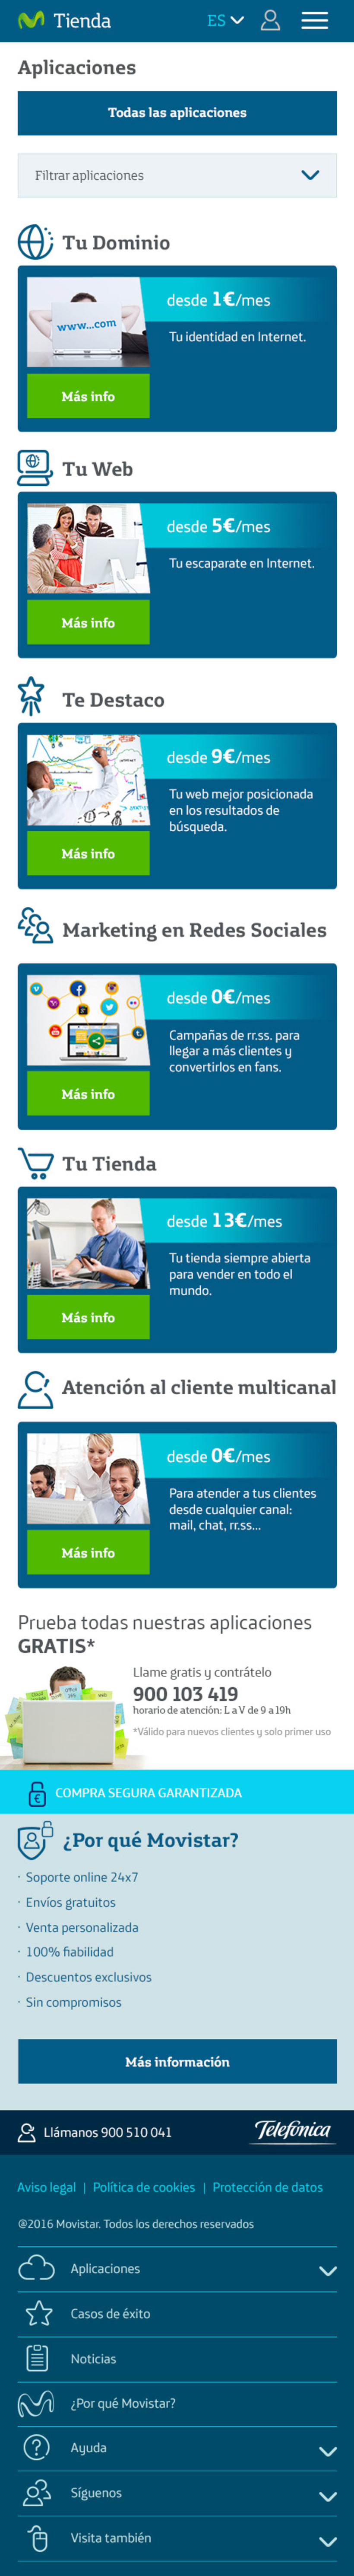 Marketplace servicios cloud 24